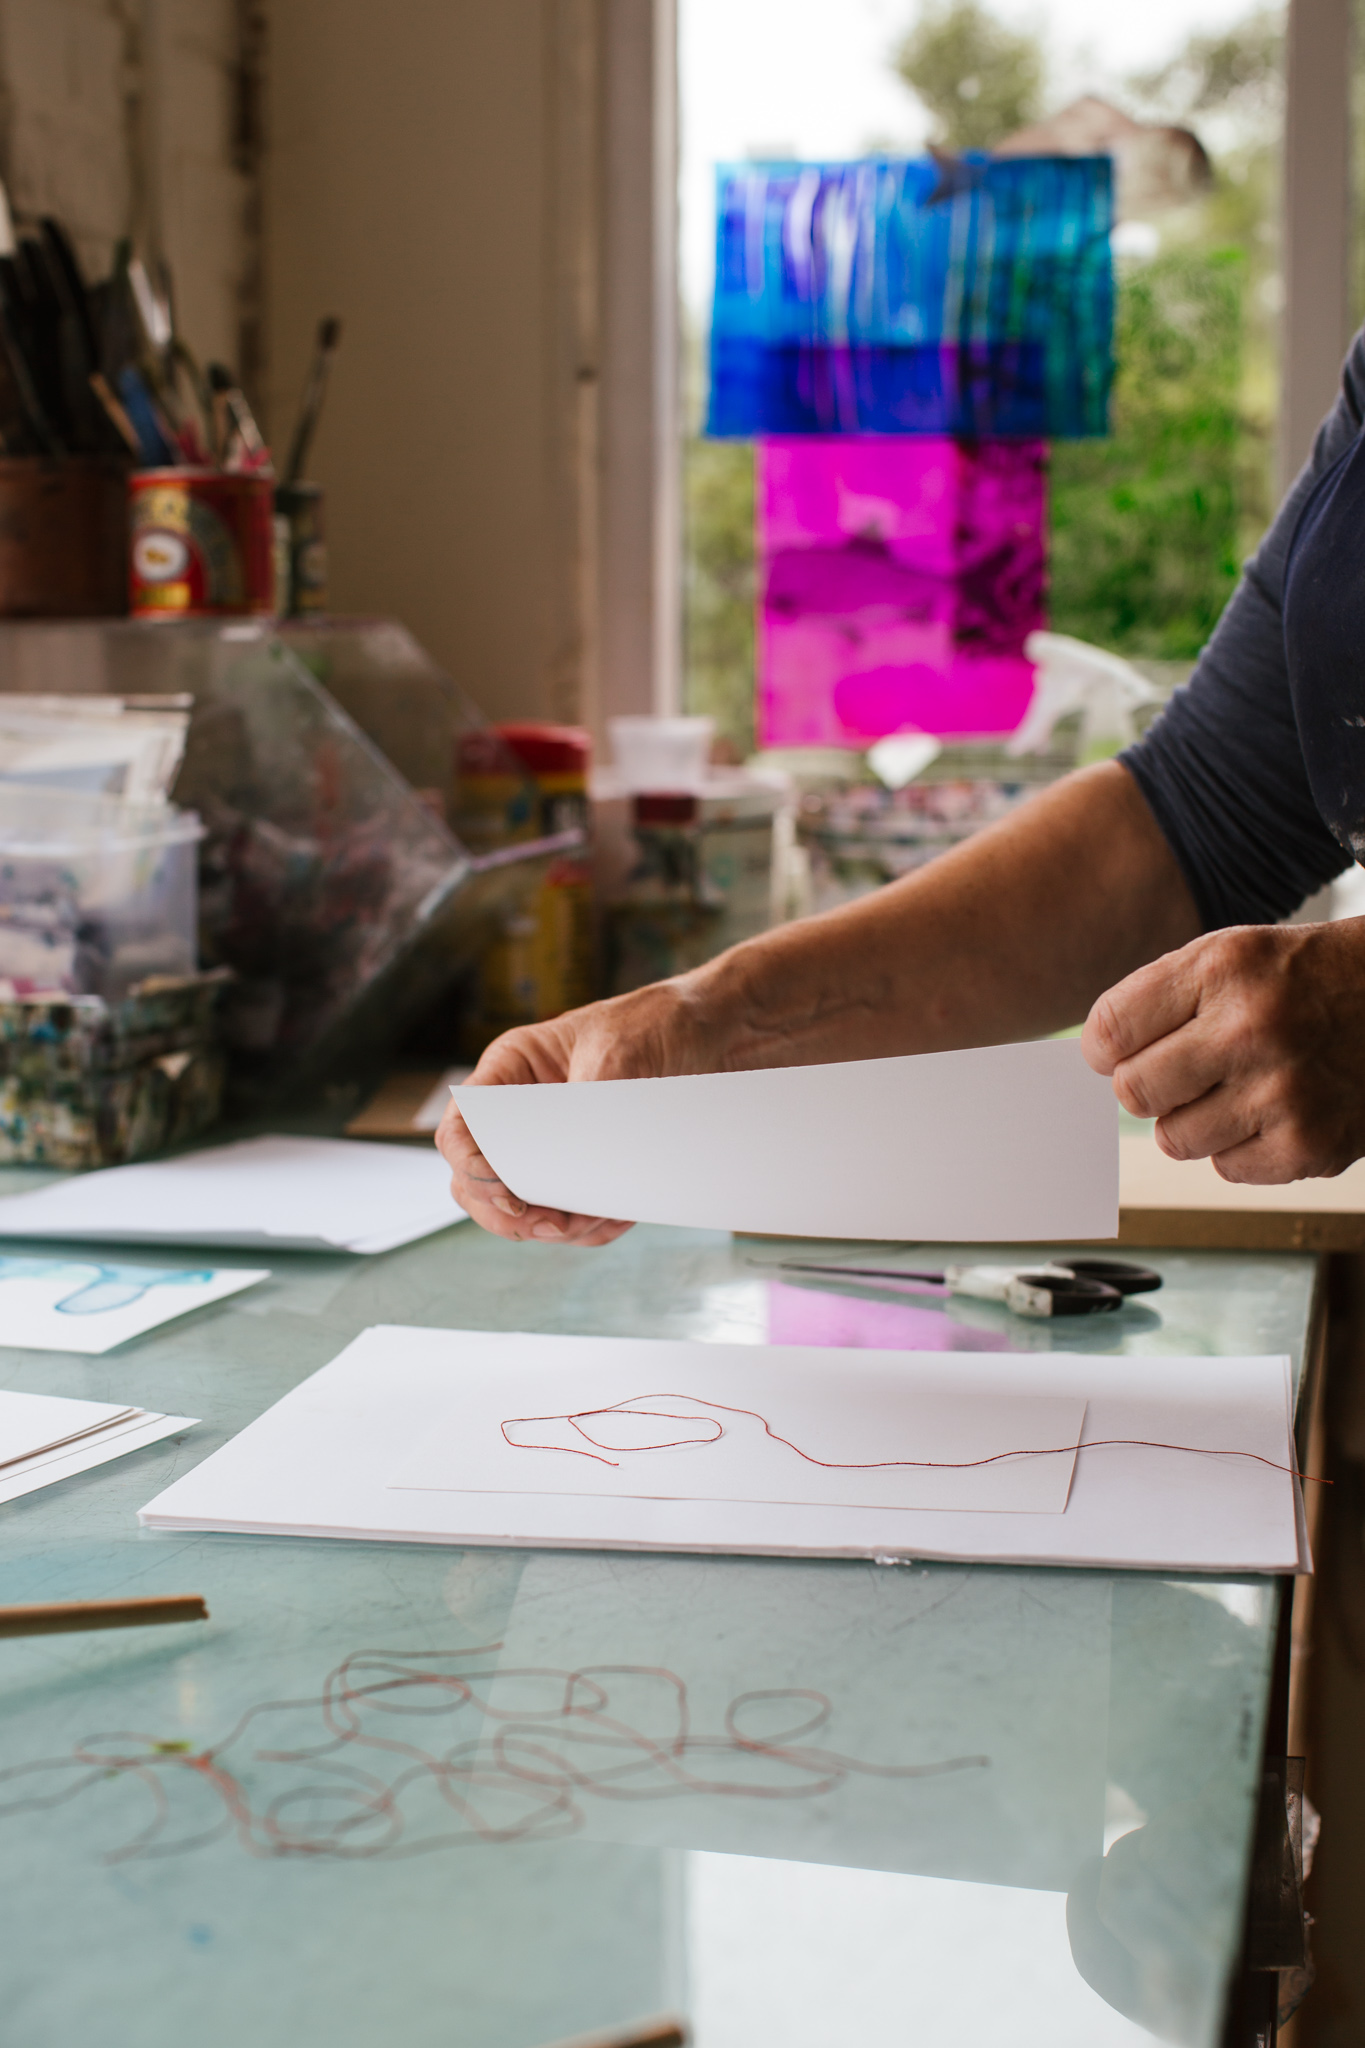 Lifestyle-artist-studio-Joanne-Crawford-Leeds-7.JPG